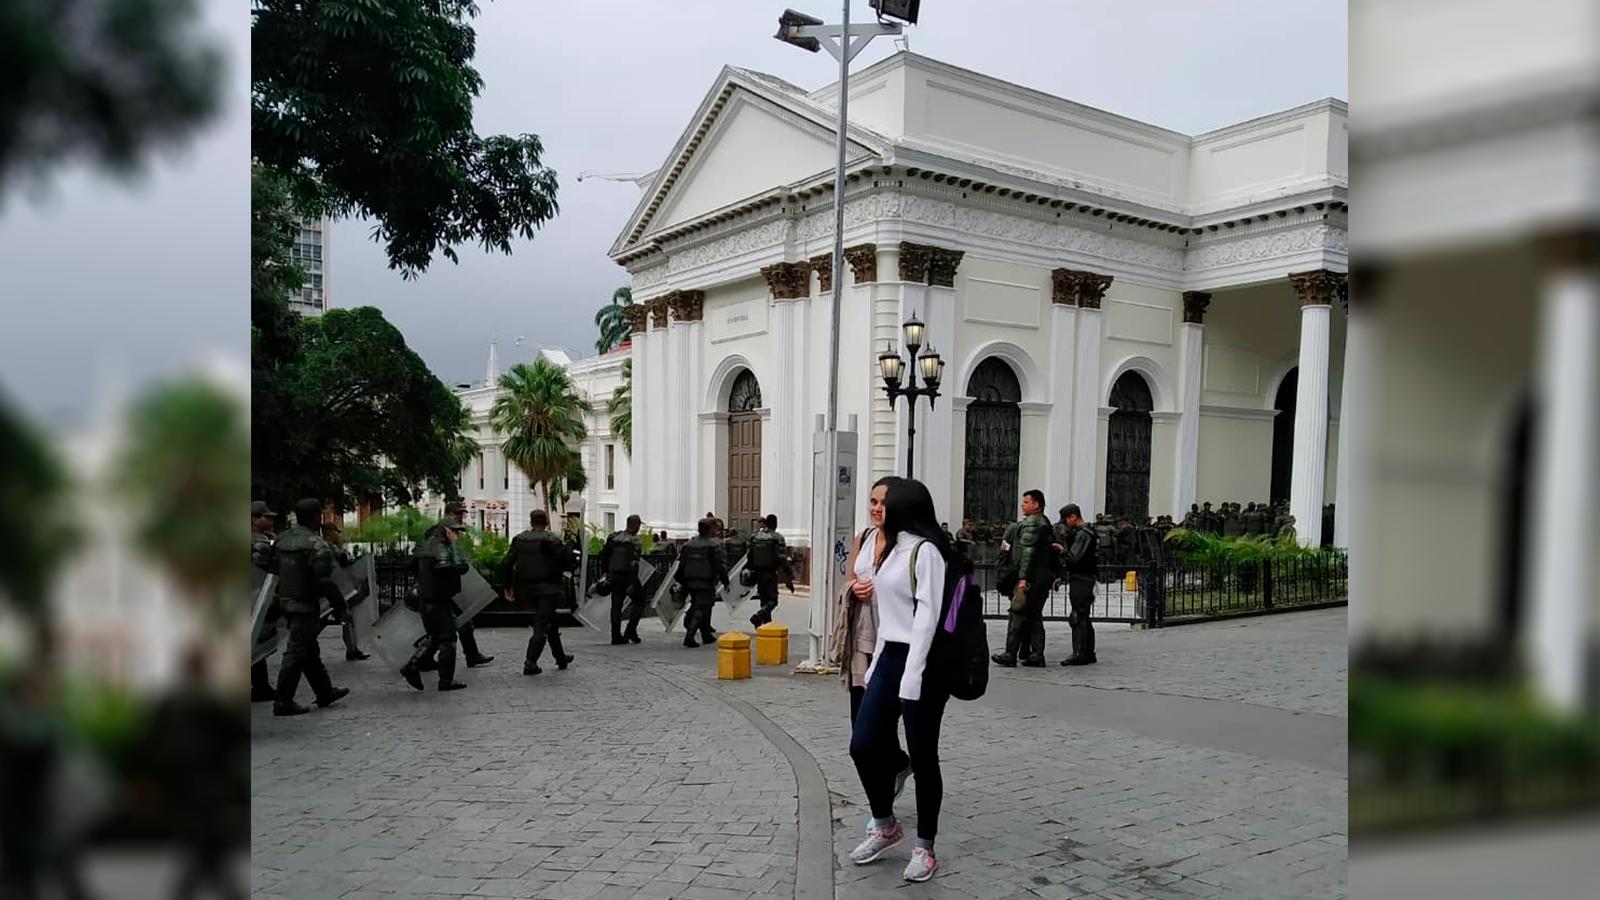 En Video|Vea cómo colectivos chavistas armados atacaron vehículo de Juan Guaidó